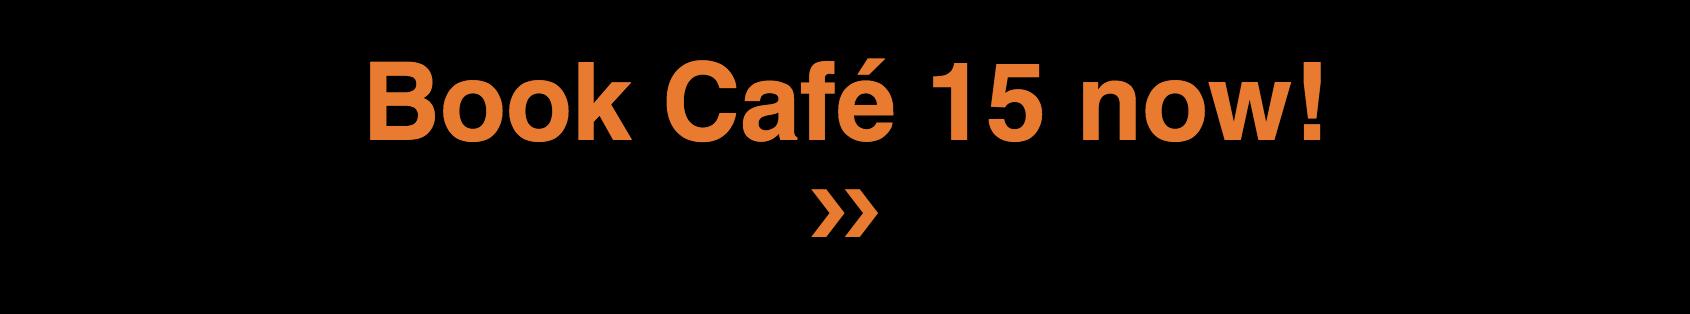 Book Café 15 Camlux Hotel- 君立咖啡室 - OKiBook Hong Kong Restaurant Booking